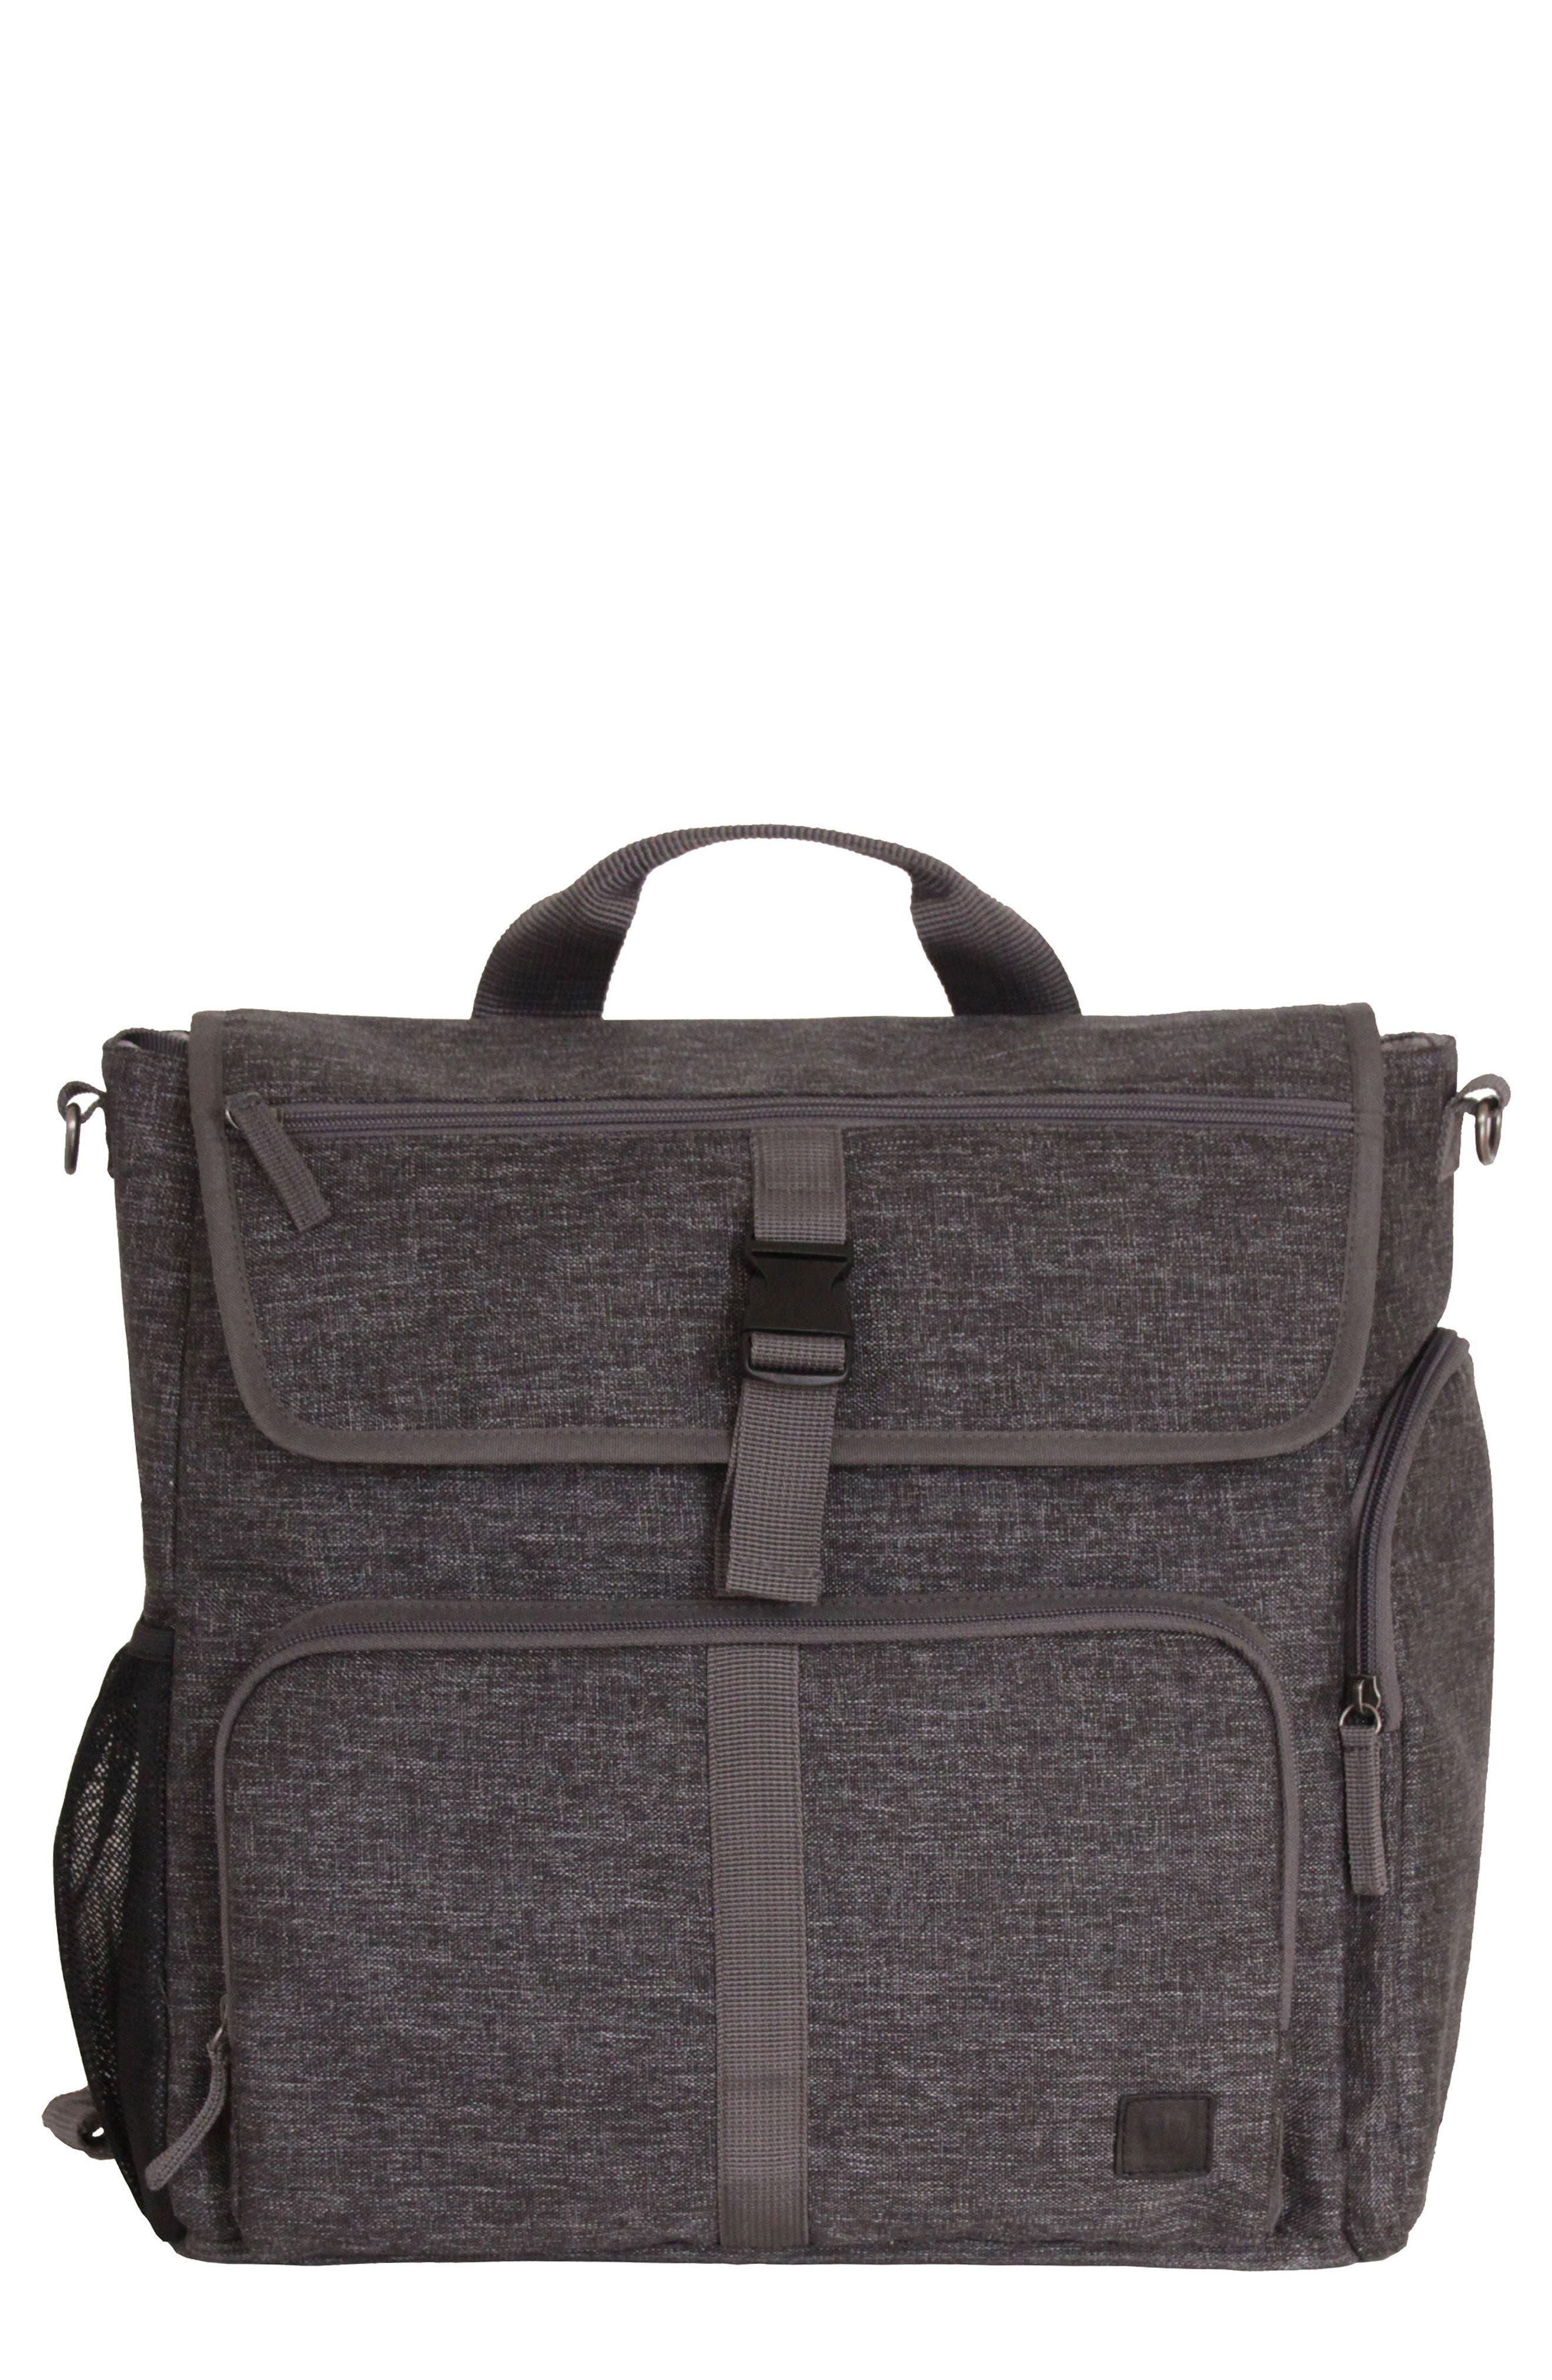 Convertible Diaper Backpack,                             Main thumbnail 1, color,                             001